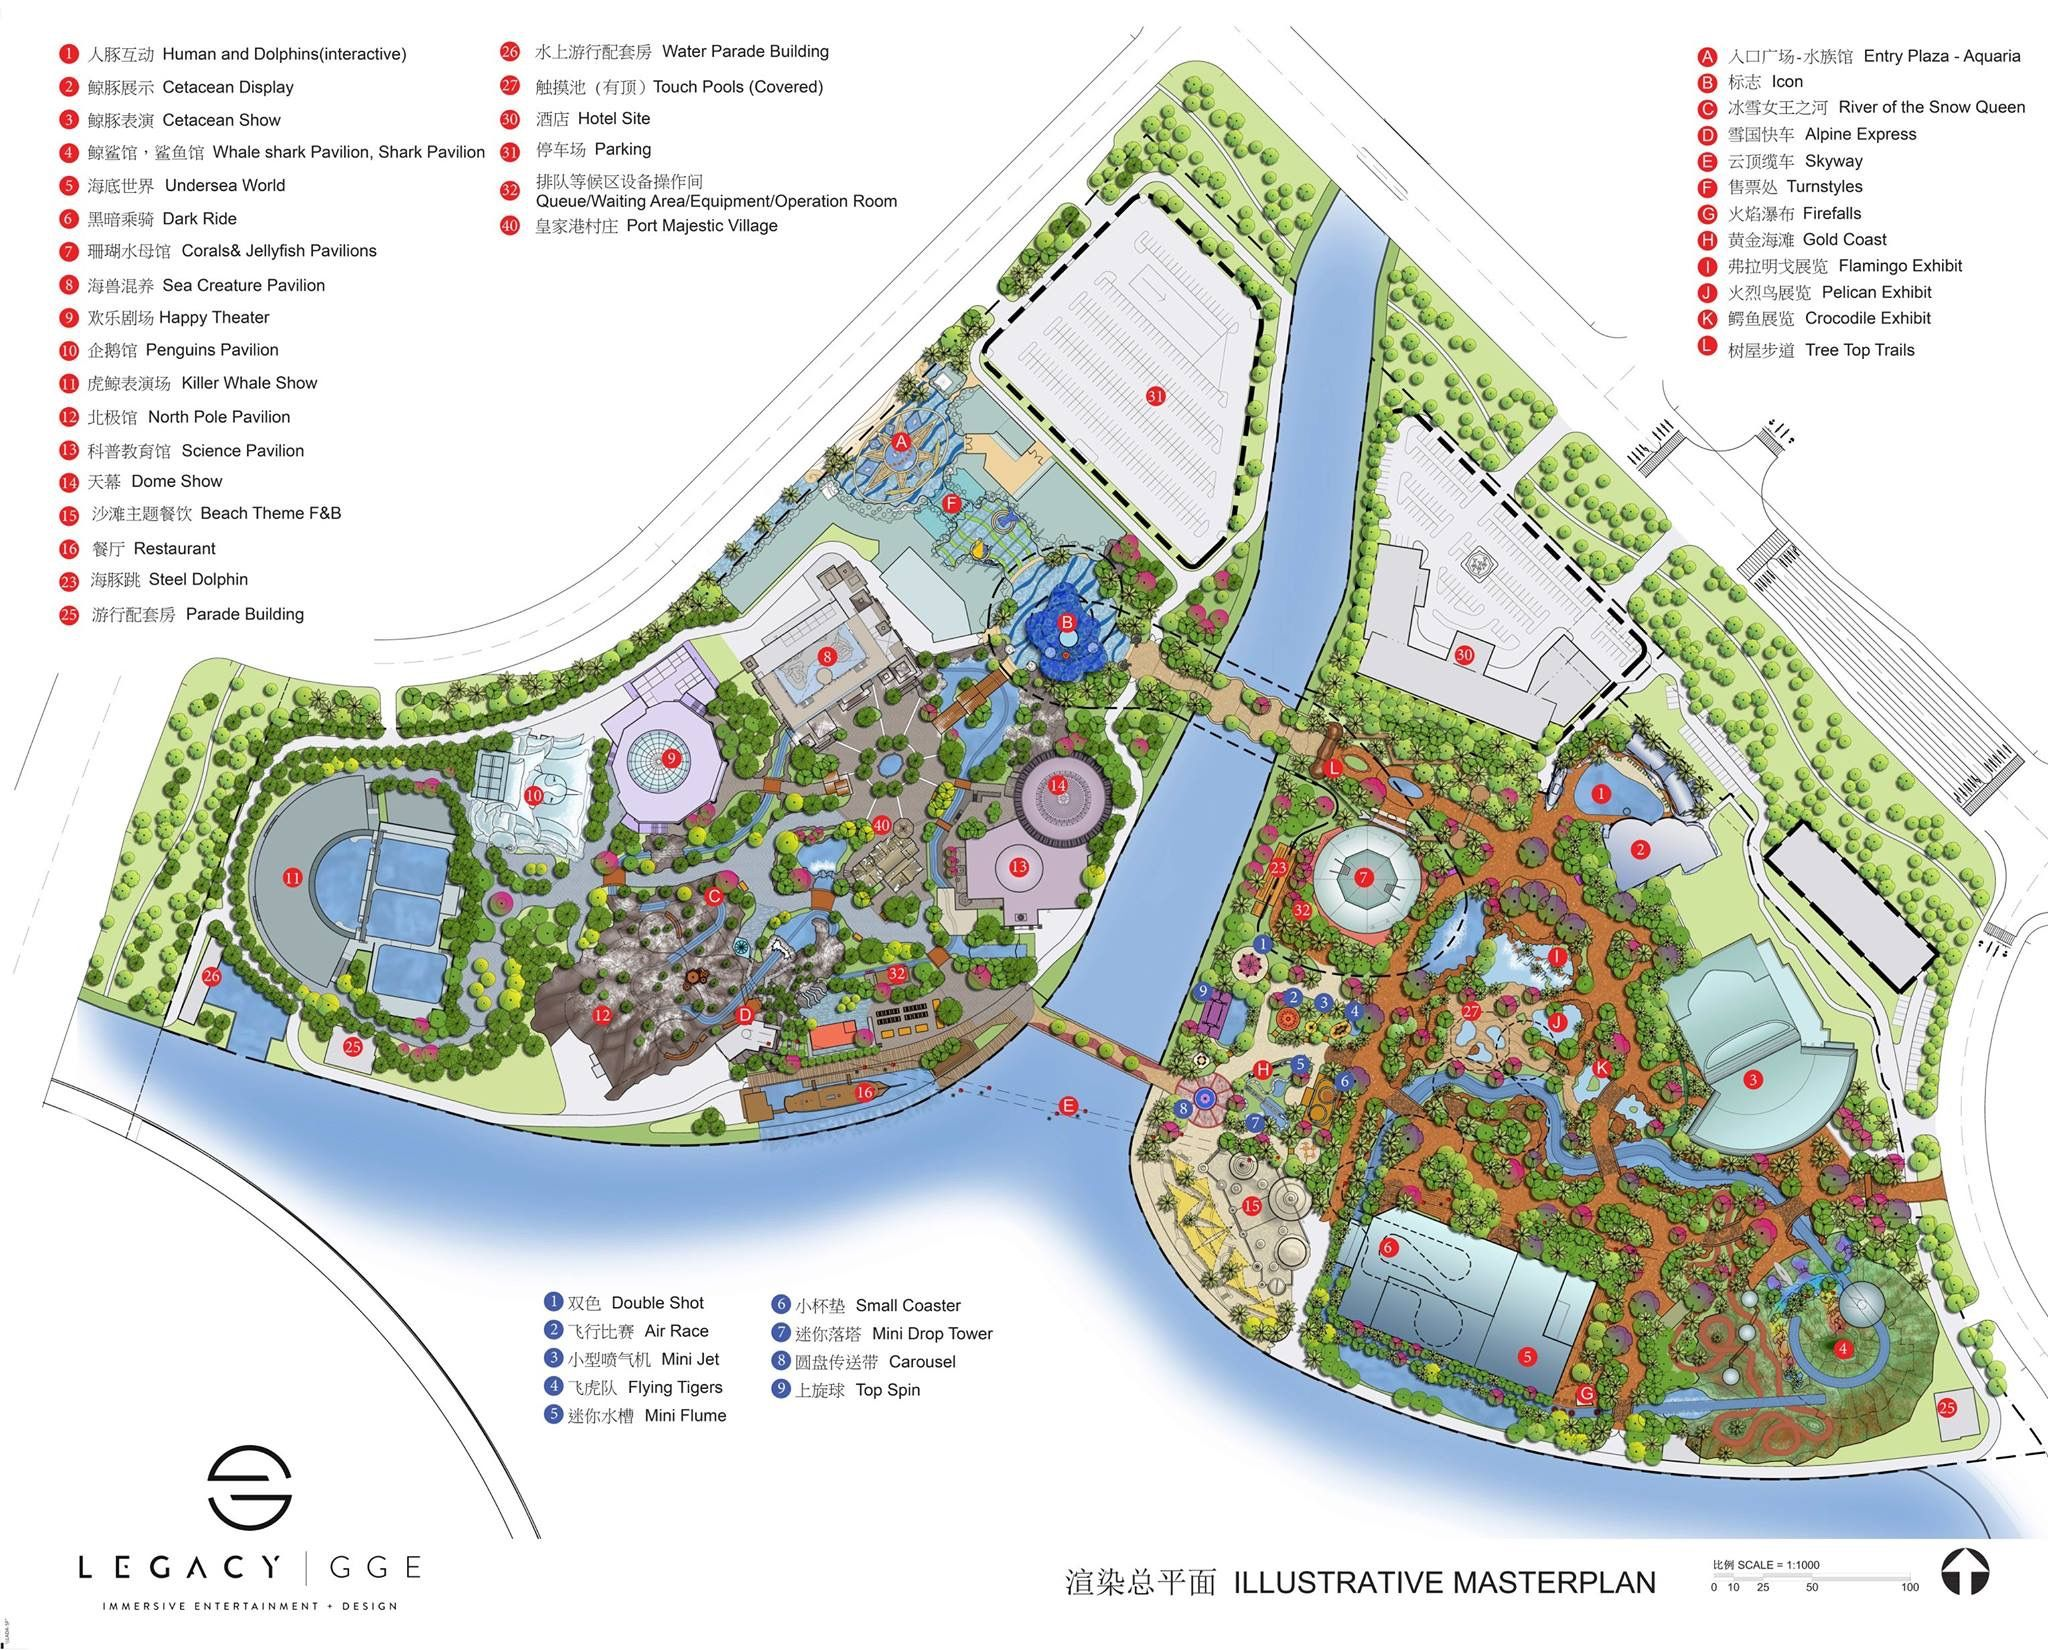 Pin By Eli Smith On Shanghai Ocean Park Concept Artwork Ocean Park Disney And More Disneyland